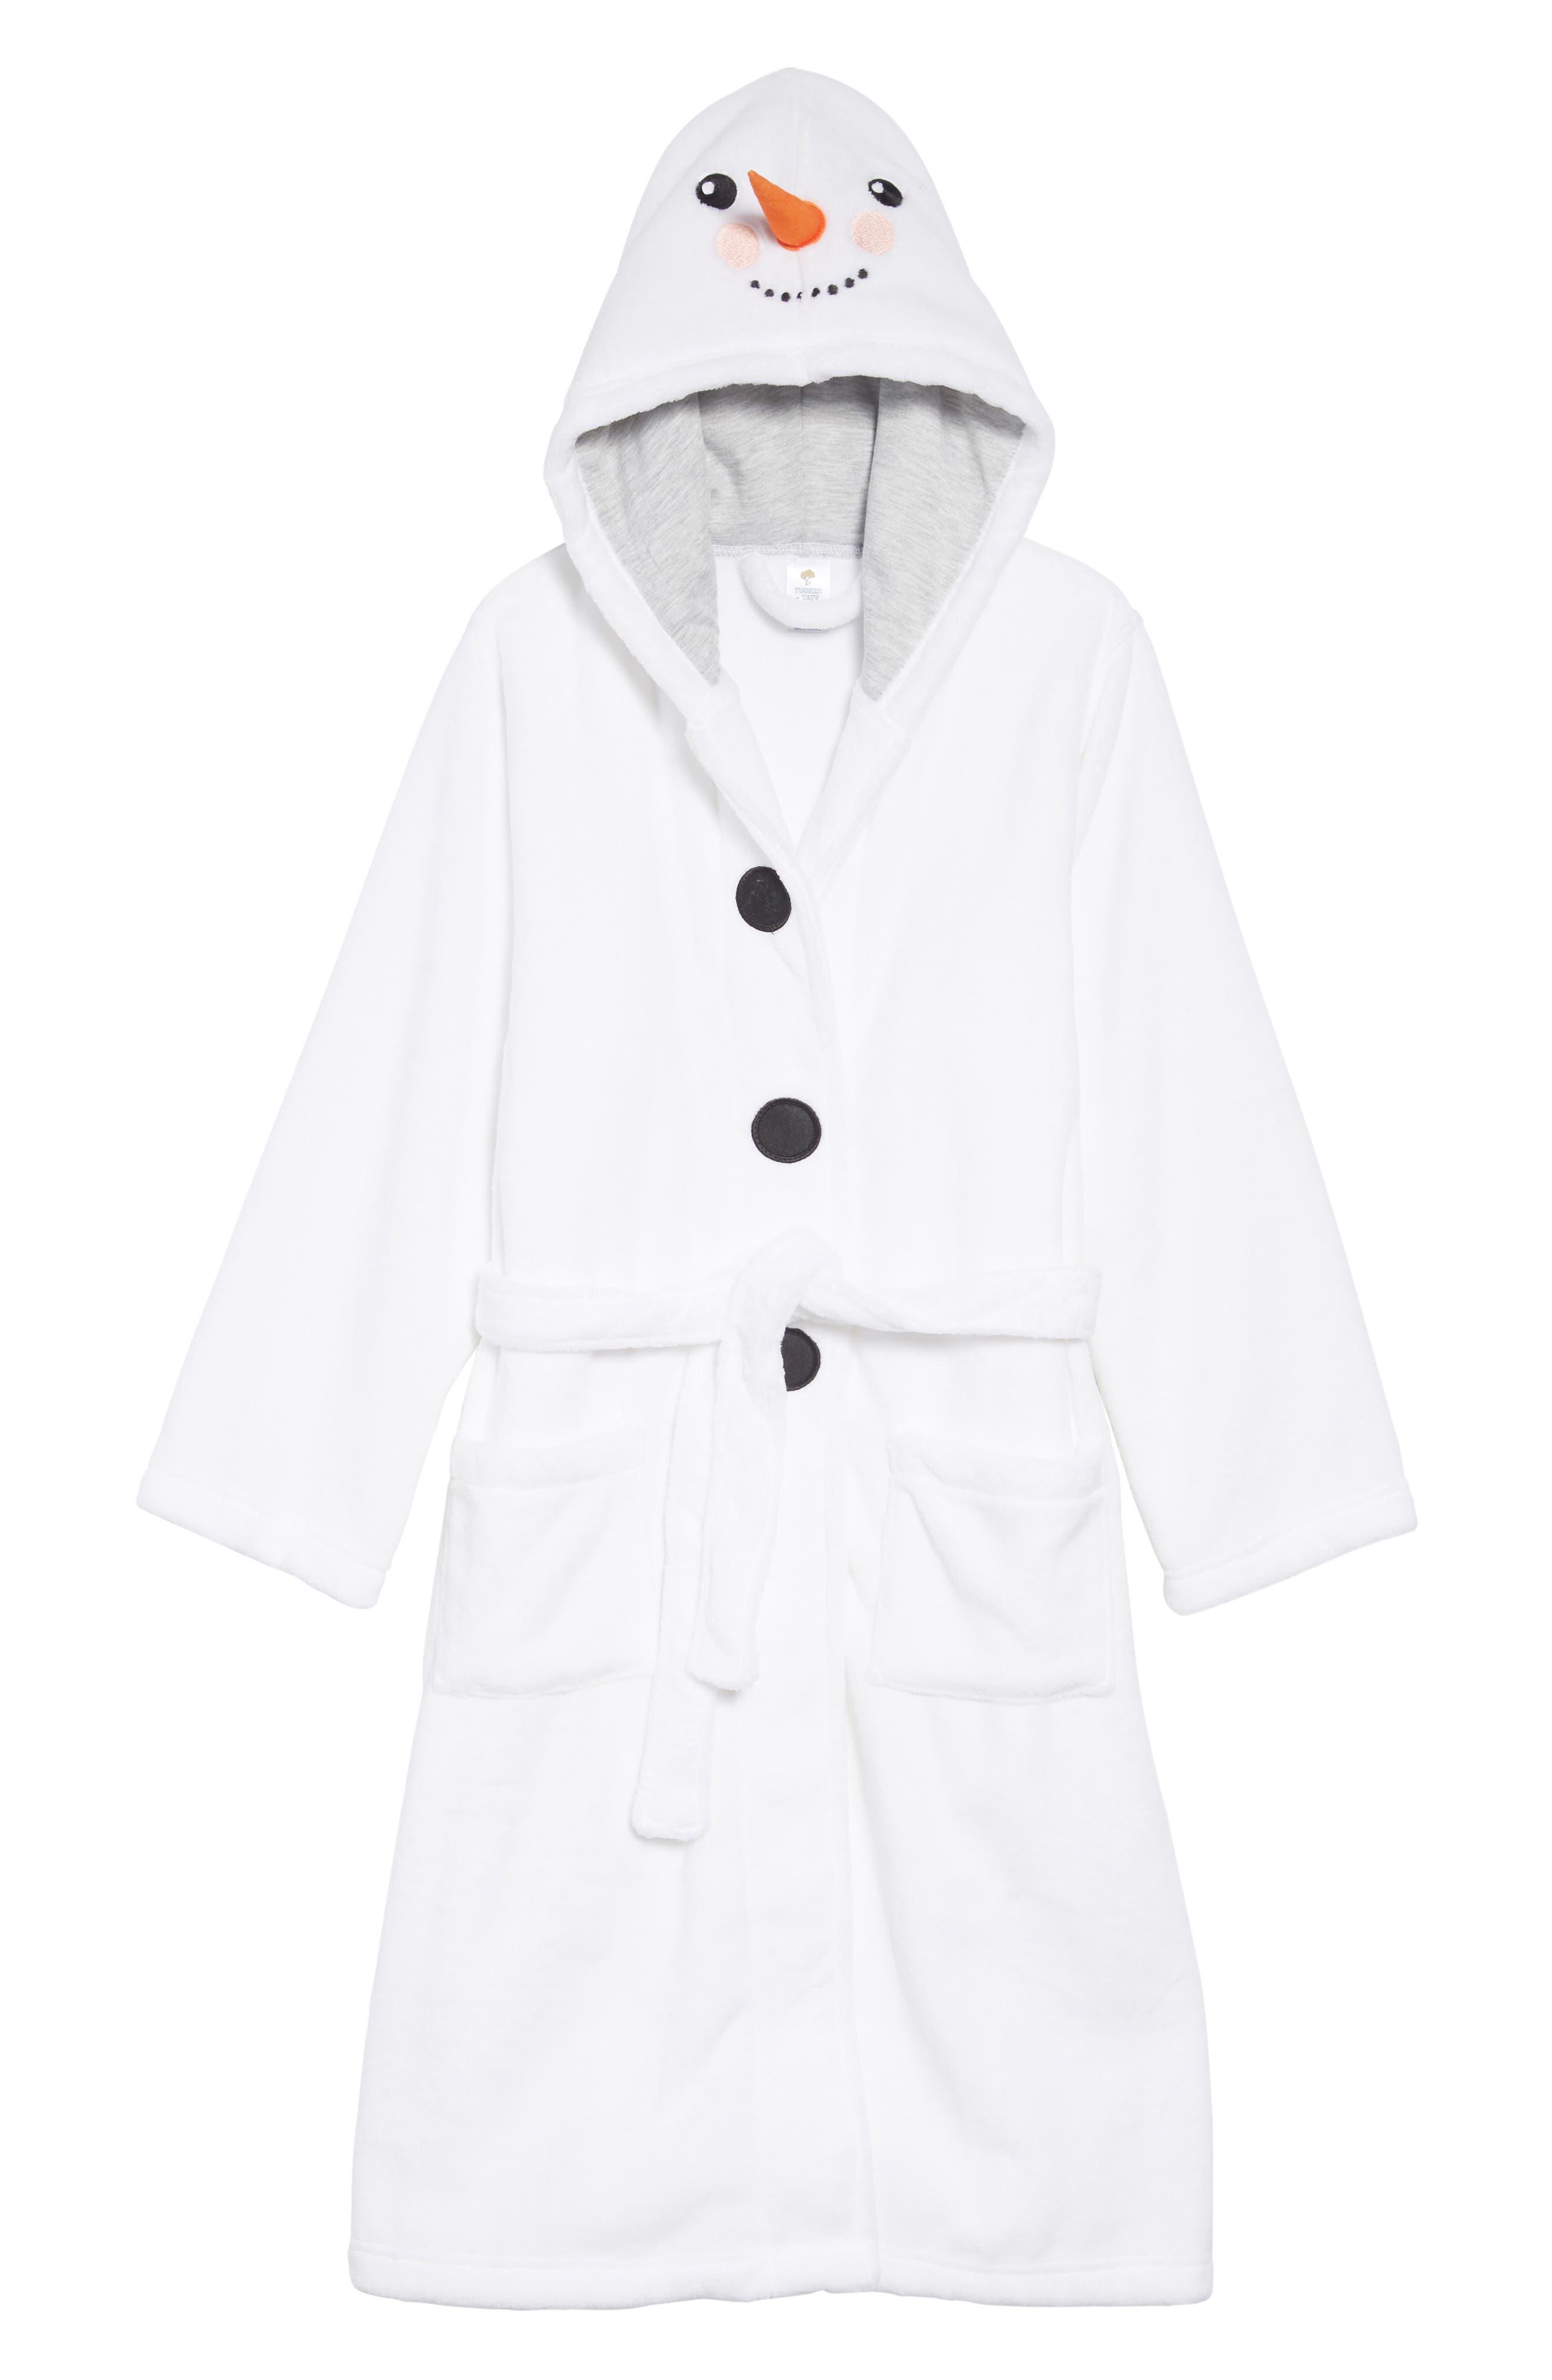 Hooded Robe,                             Main thumbnail 1, color,                             WHITE SNOWMAN